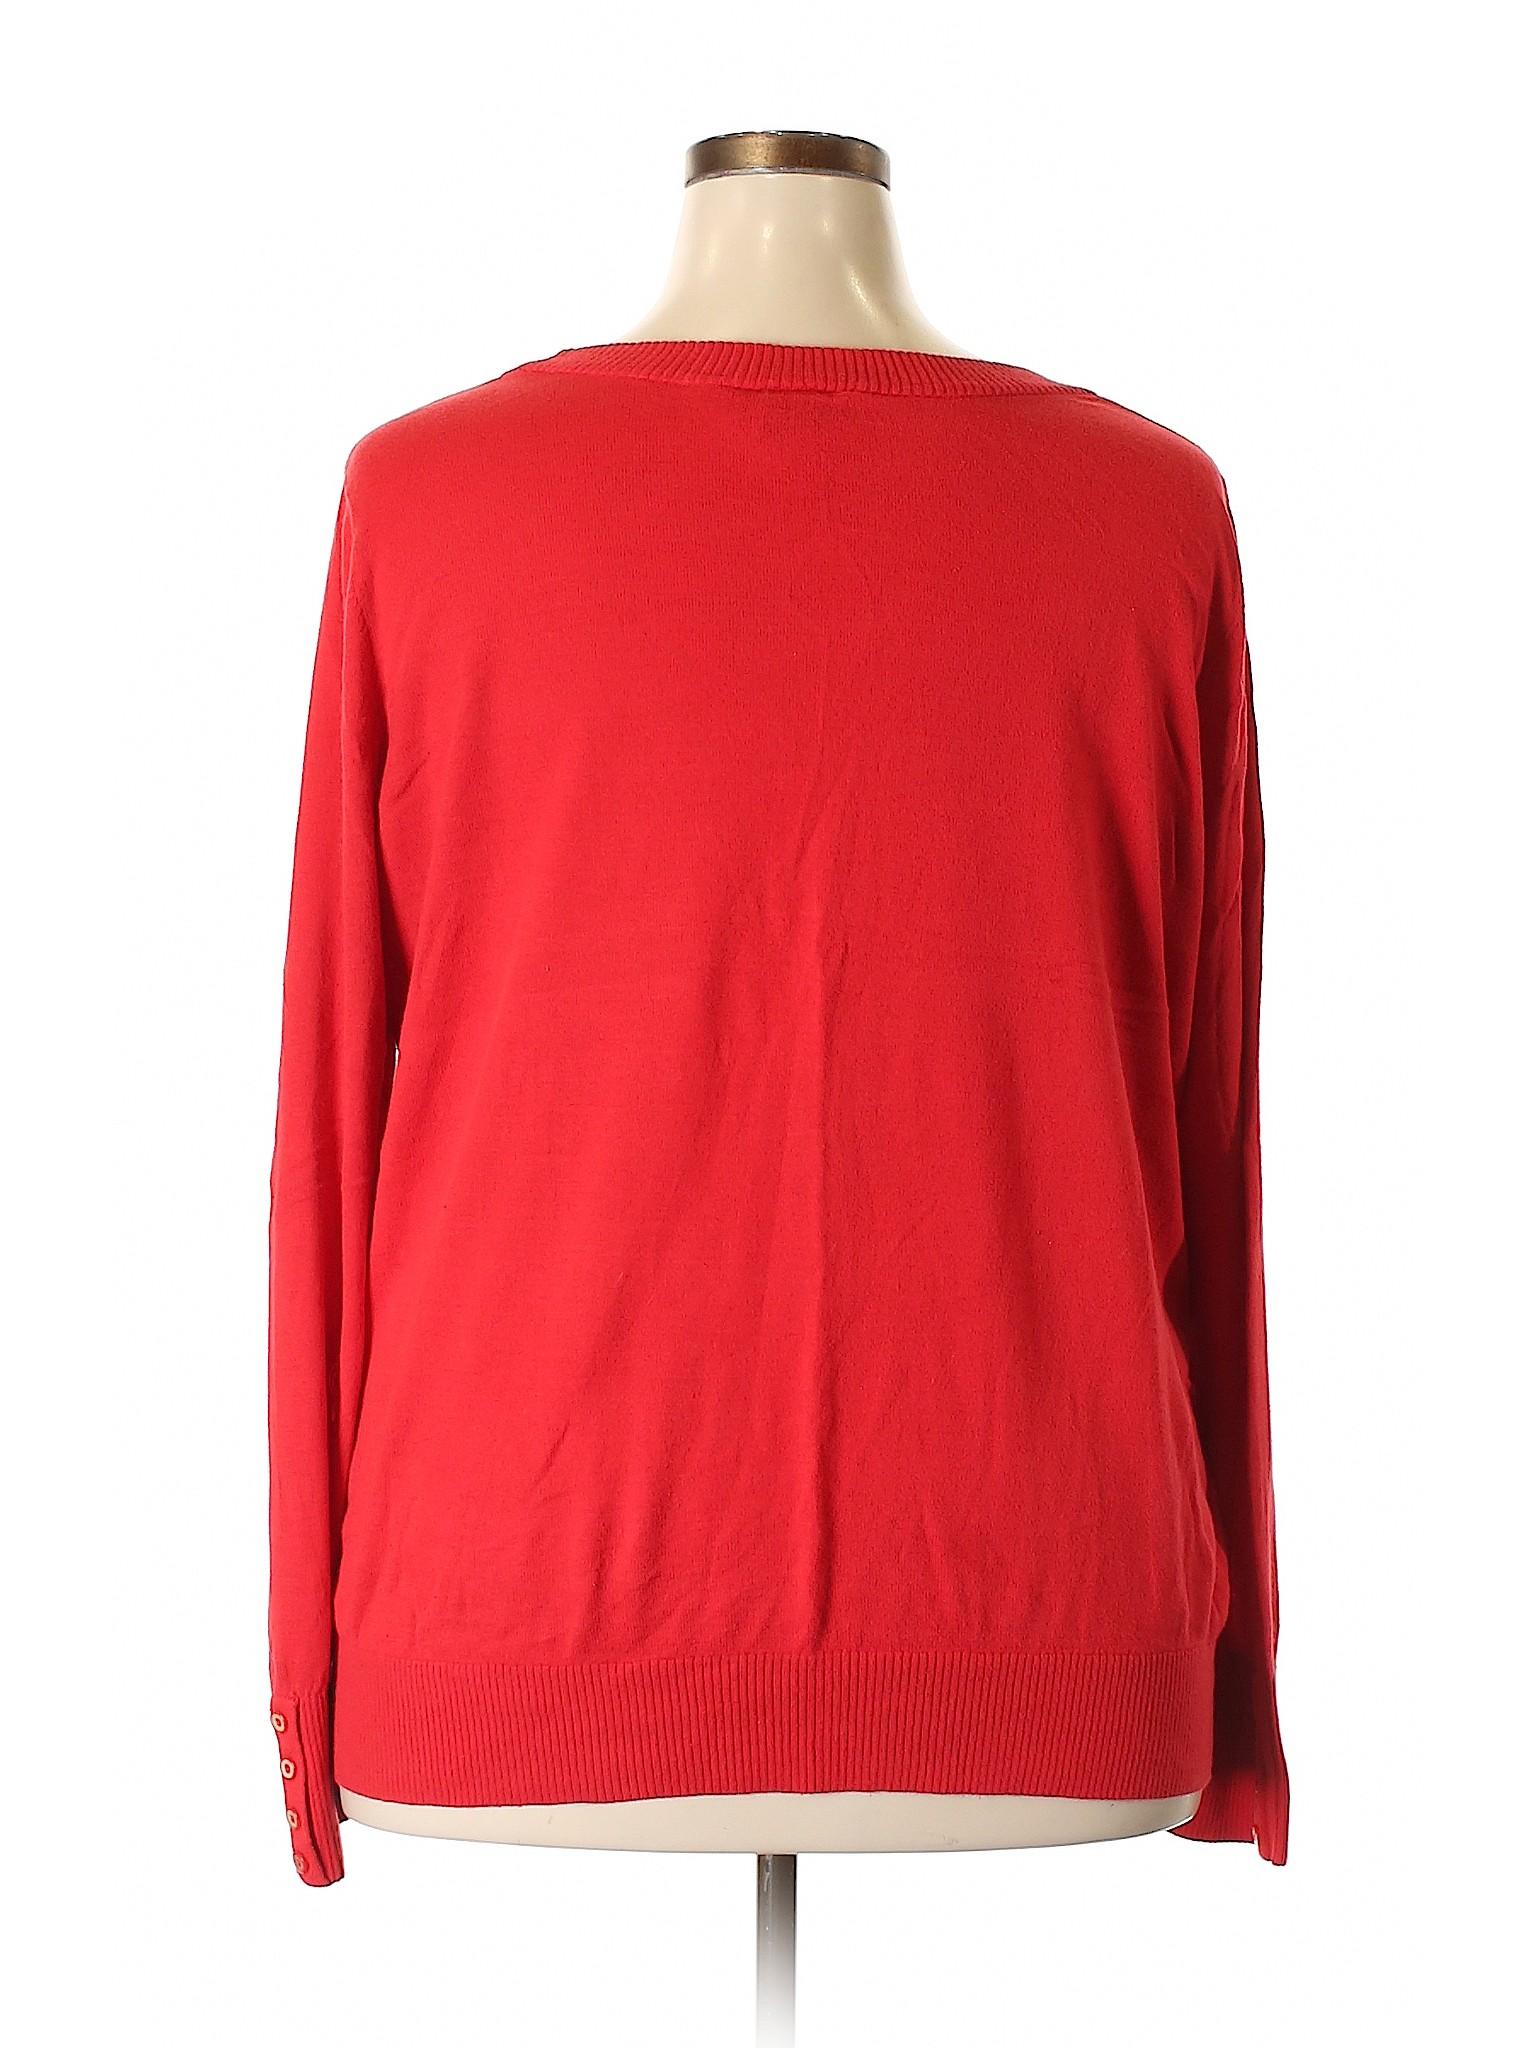 Sweater Pullover Bryant Boutique Boutique Lane Lane xvRZXq